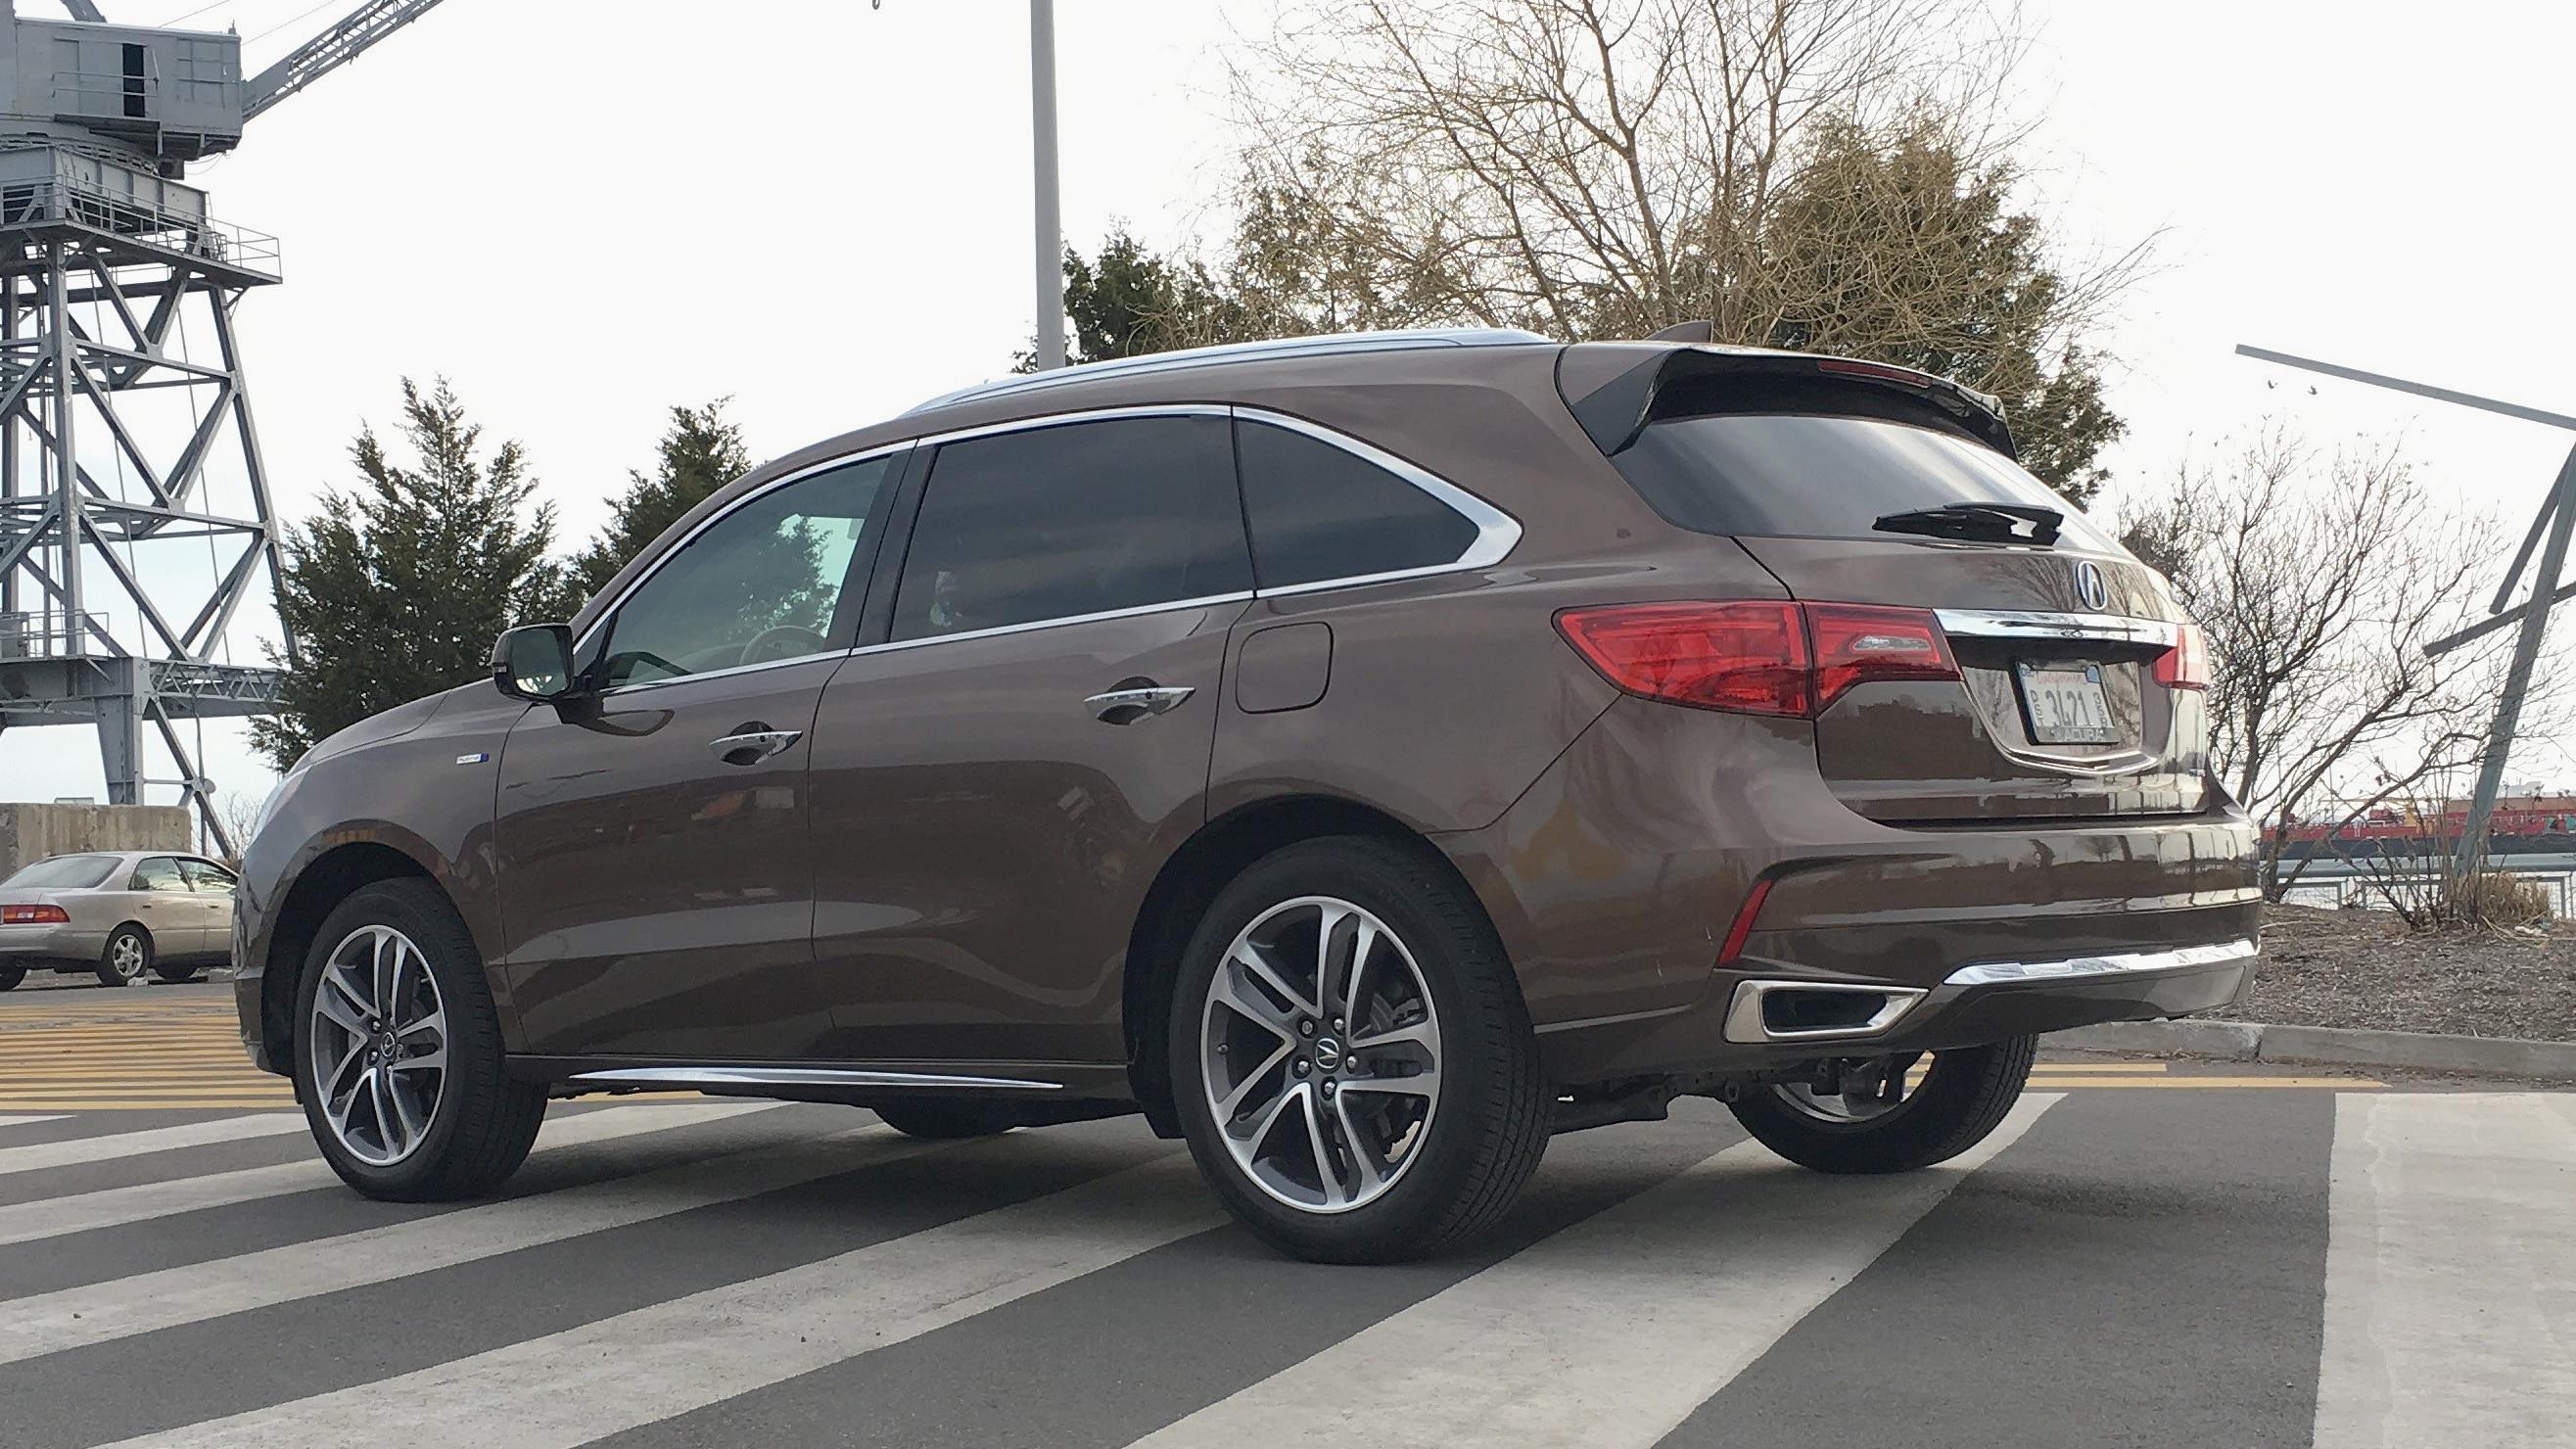 2019 Acura MDX Sport Hybrid Rear Three Quarter